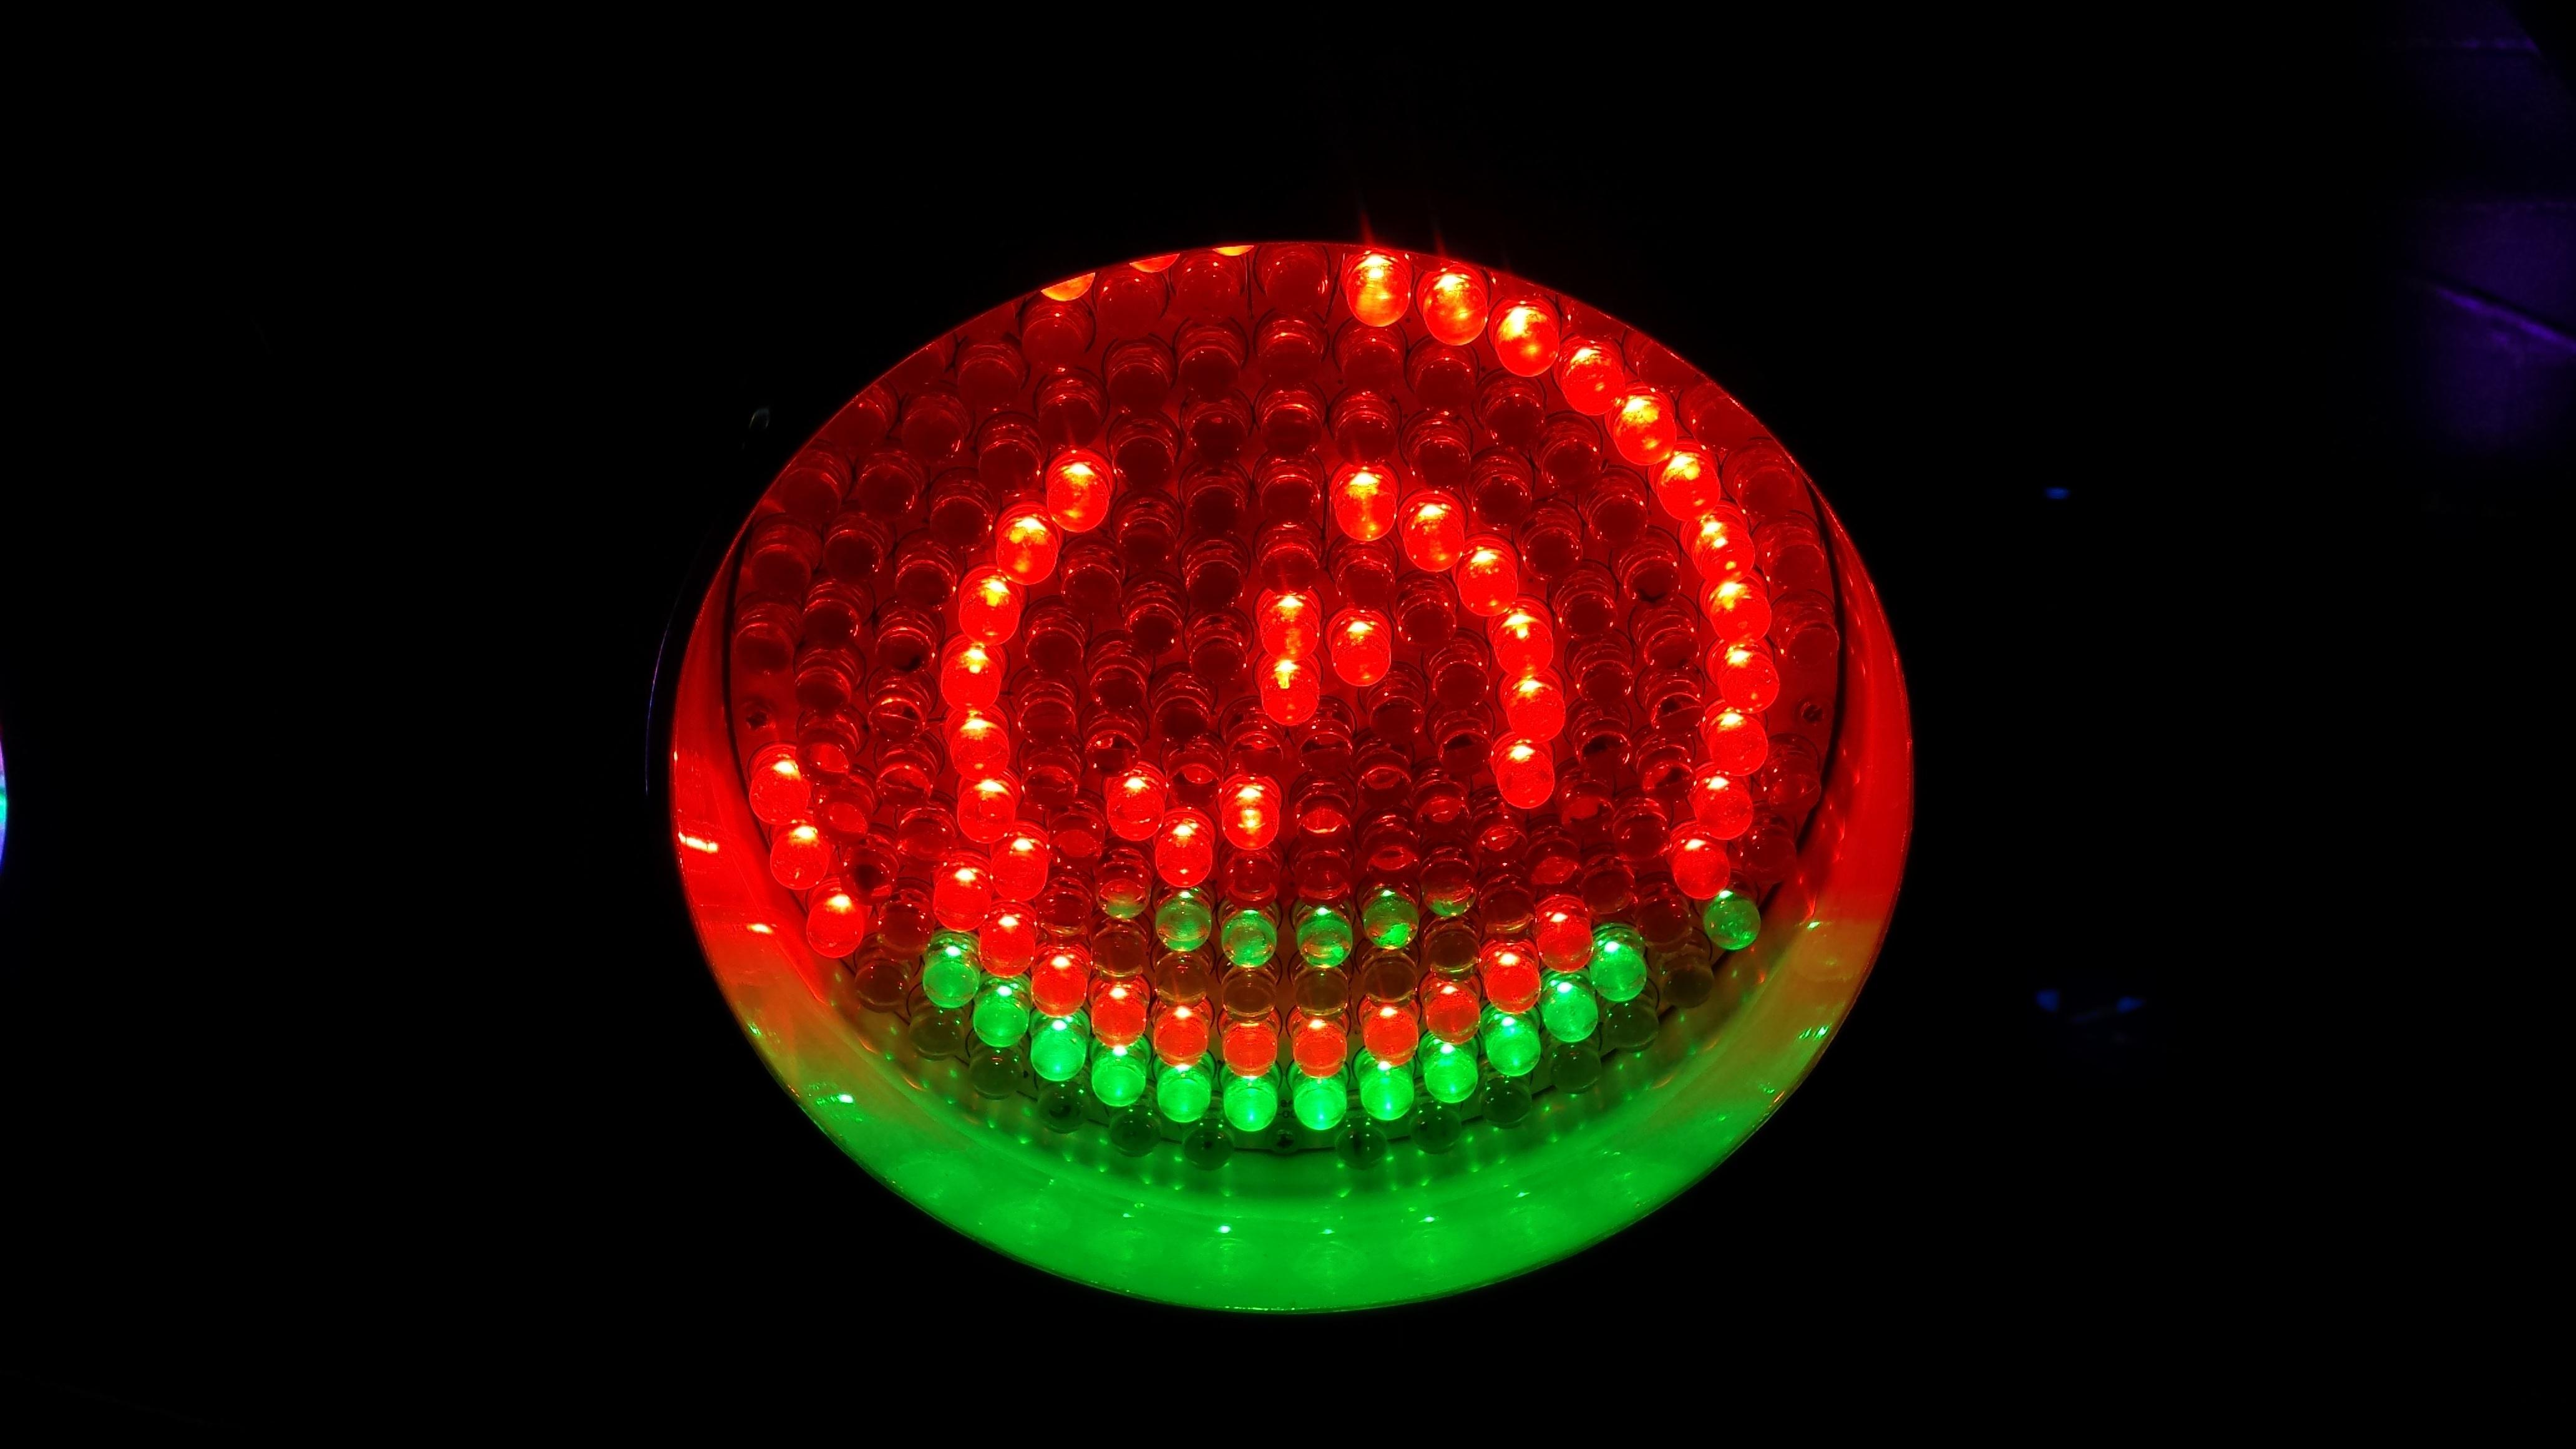 Kostenlose foto grn rot farbe lampe bunt schlieen licht grn rot farbe lampe bunt schlieen beleuchtung kreis energie kreis festival birnen party kugel strahlen parisarafo Image collections